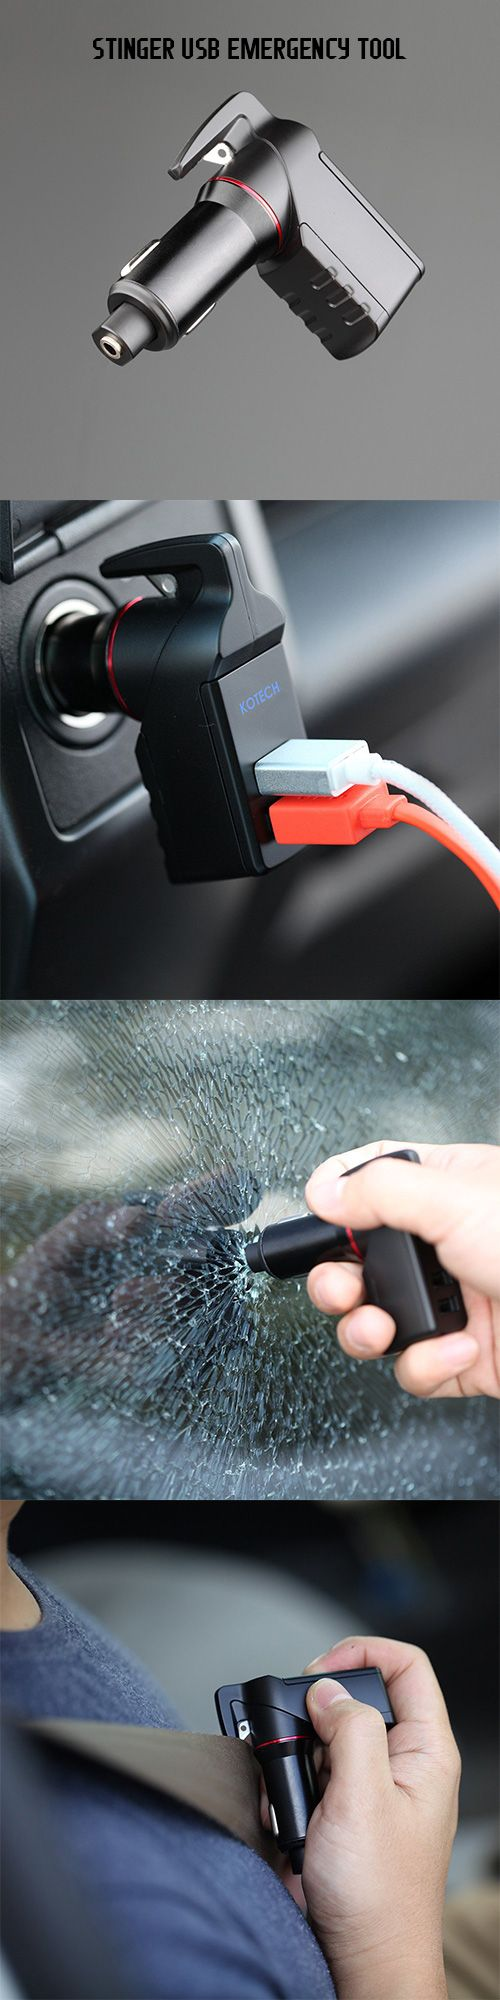 Cool gadget ever! STINGER USB EMERGENCY TOOL useful gadget car accessories tech gadget